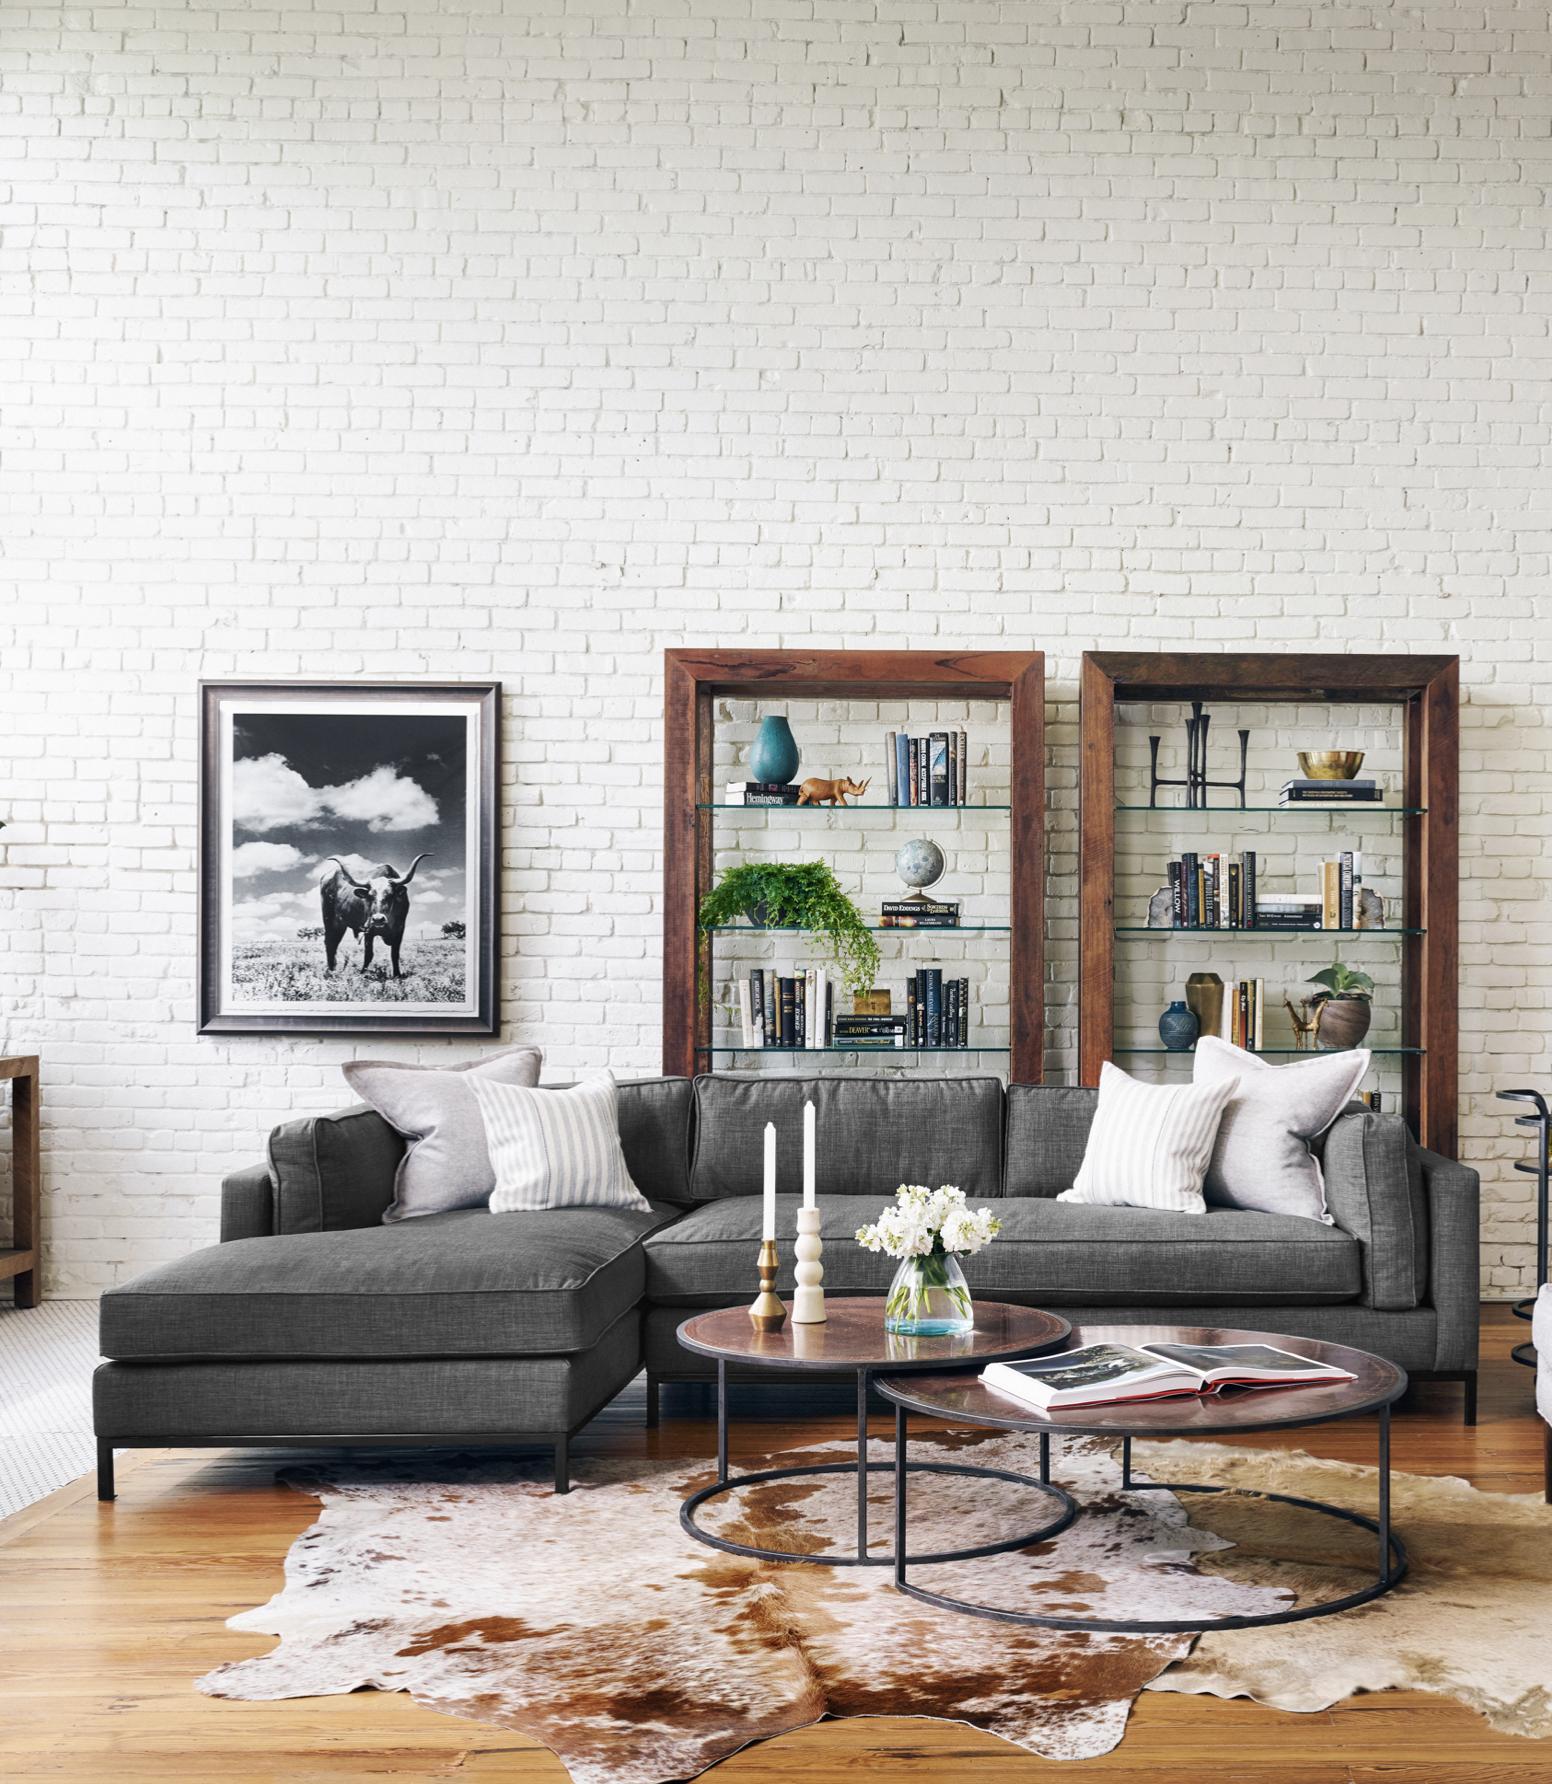 York Loft  Living room decor, Small room design, Living room designs